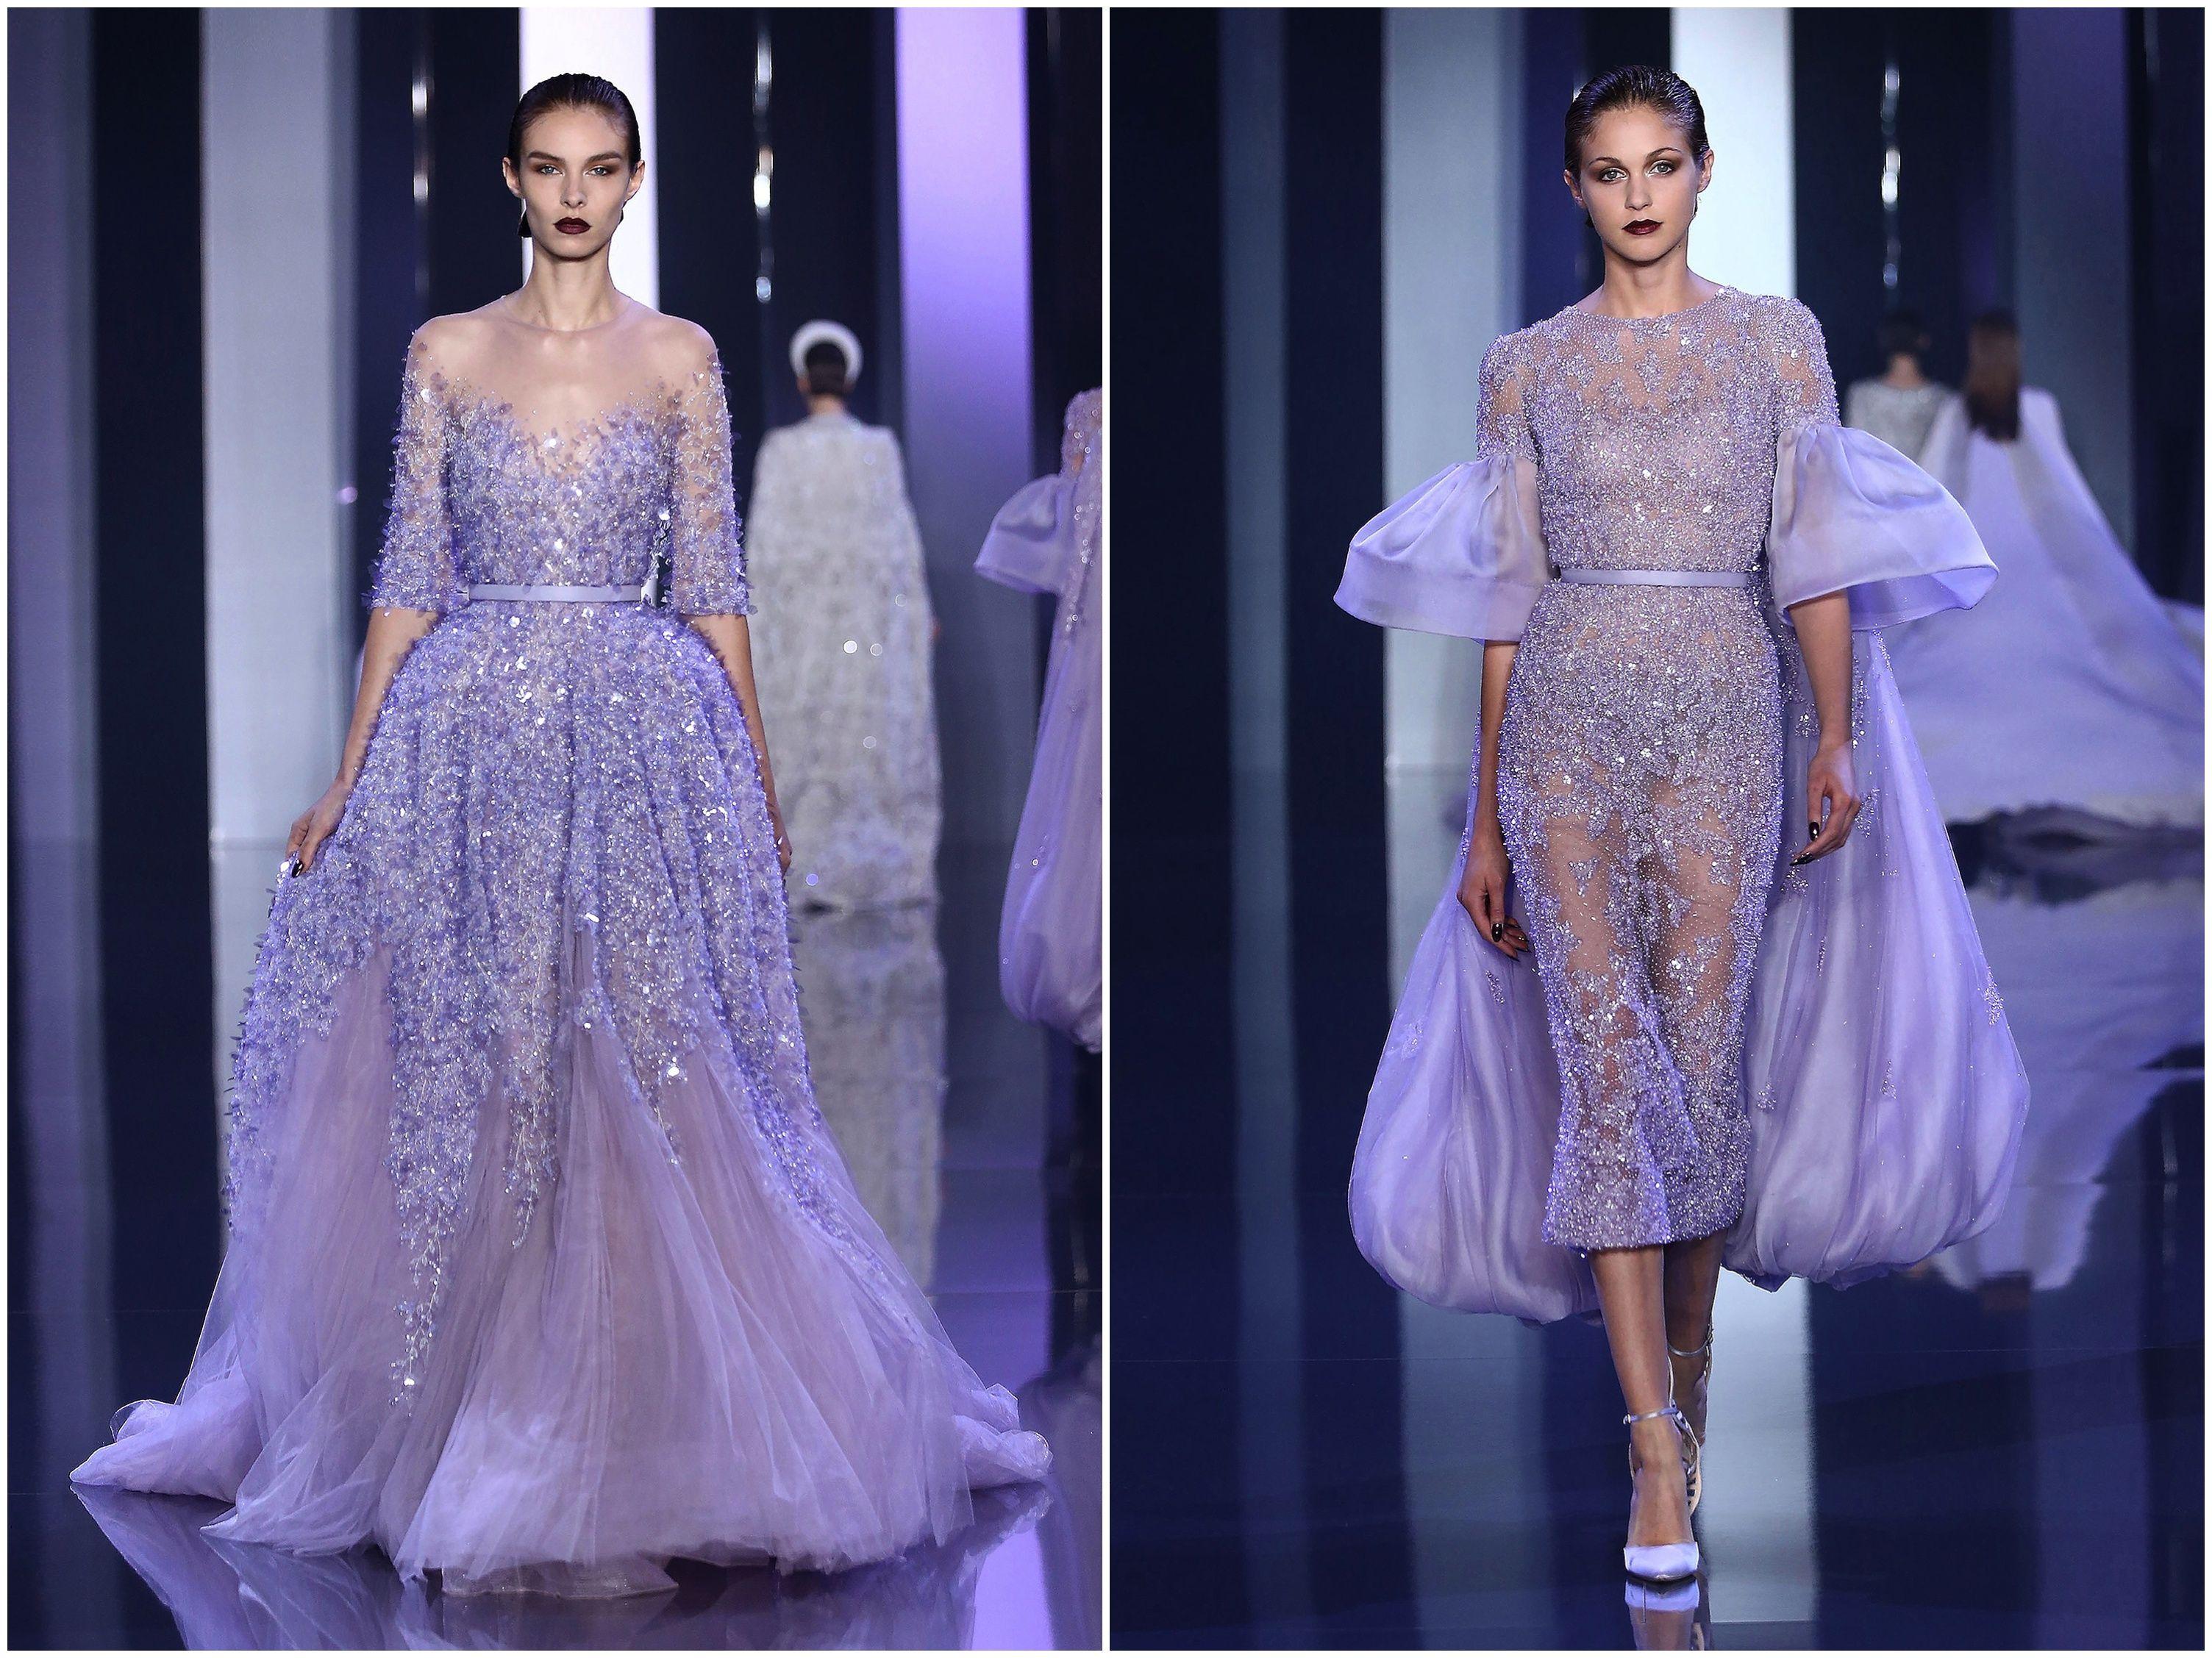 Mobili Russo ~ Couture round up ralph russo bouchra jarrar rami kadi and